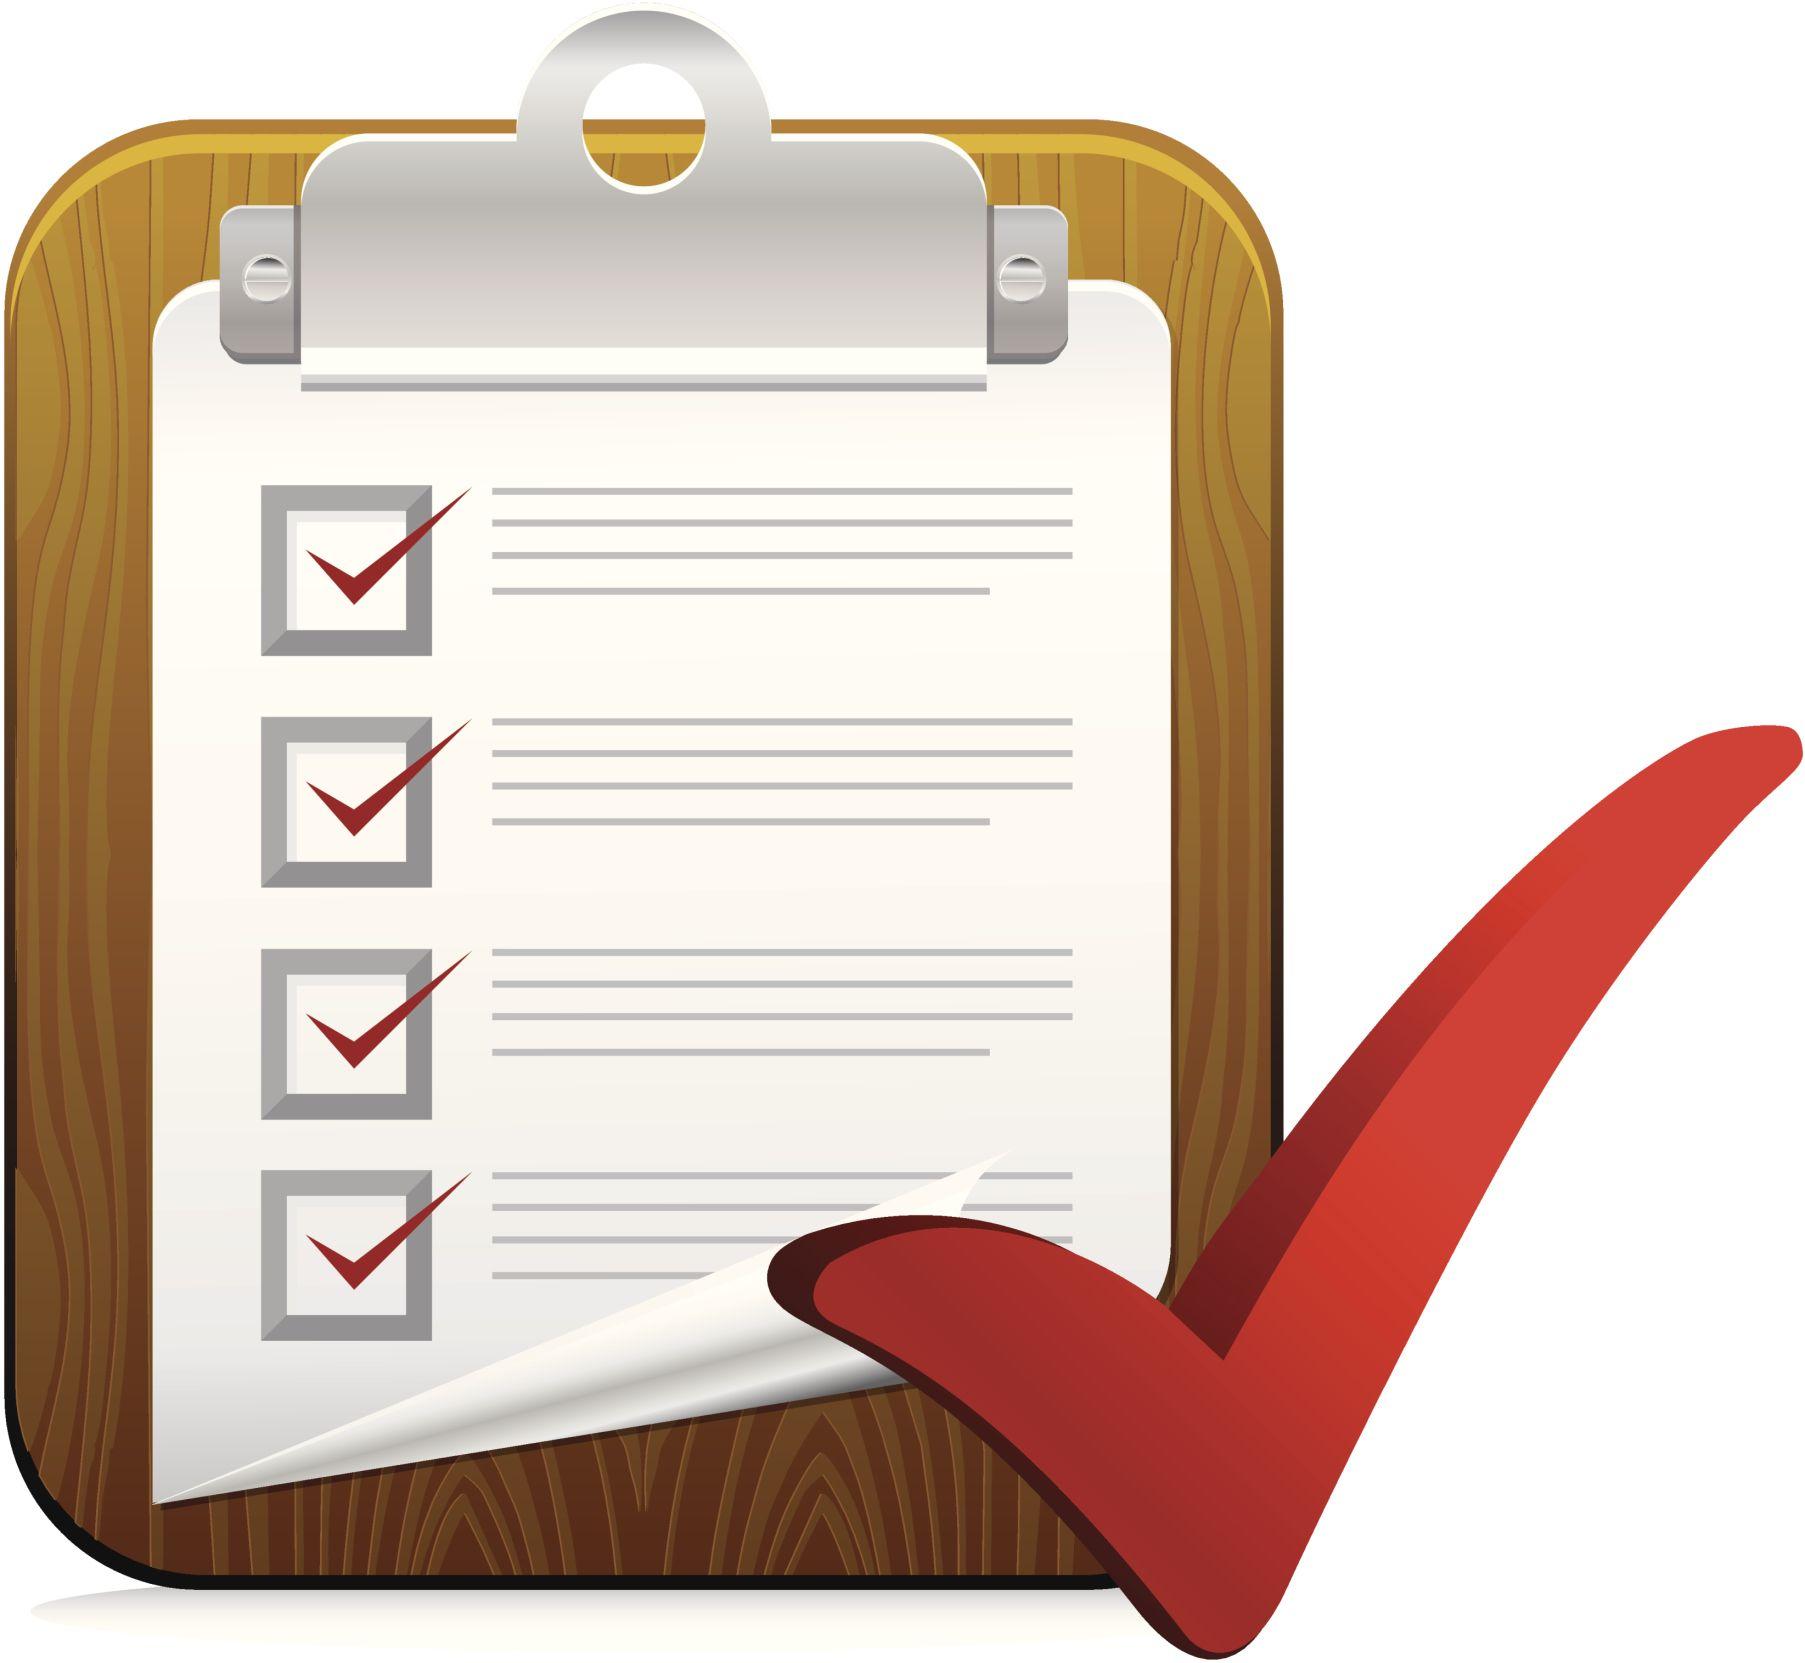 Preparing for Surgery: Health Condition Checklist